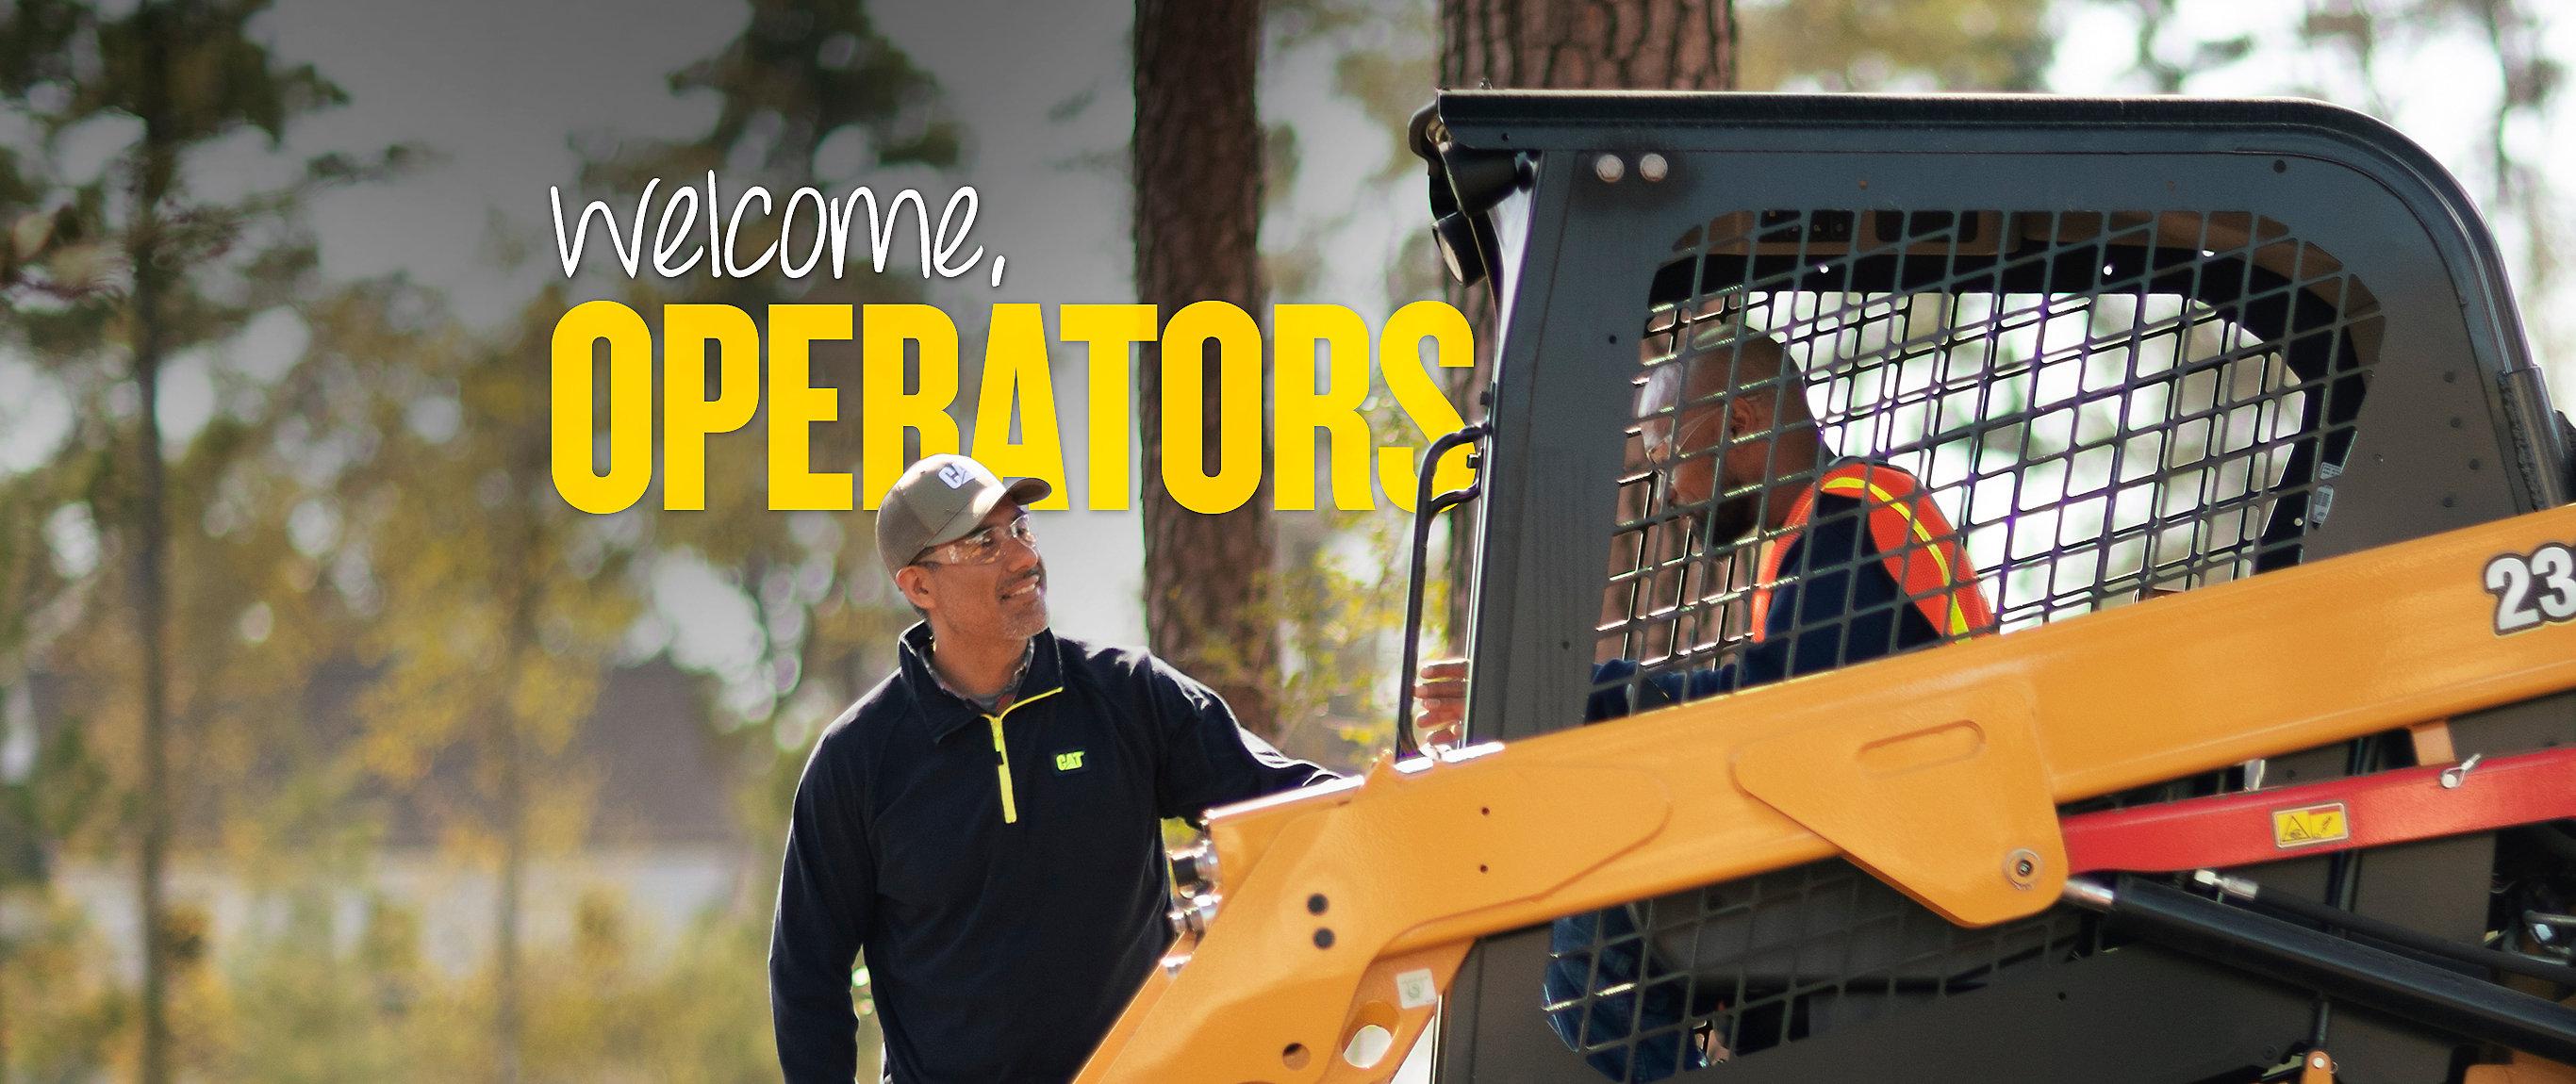 Welcome, Operators